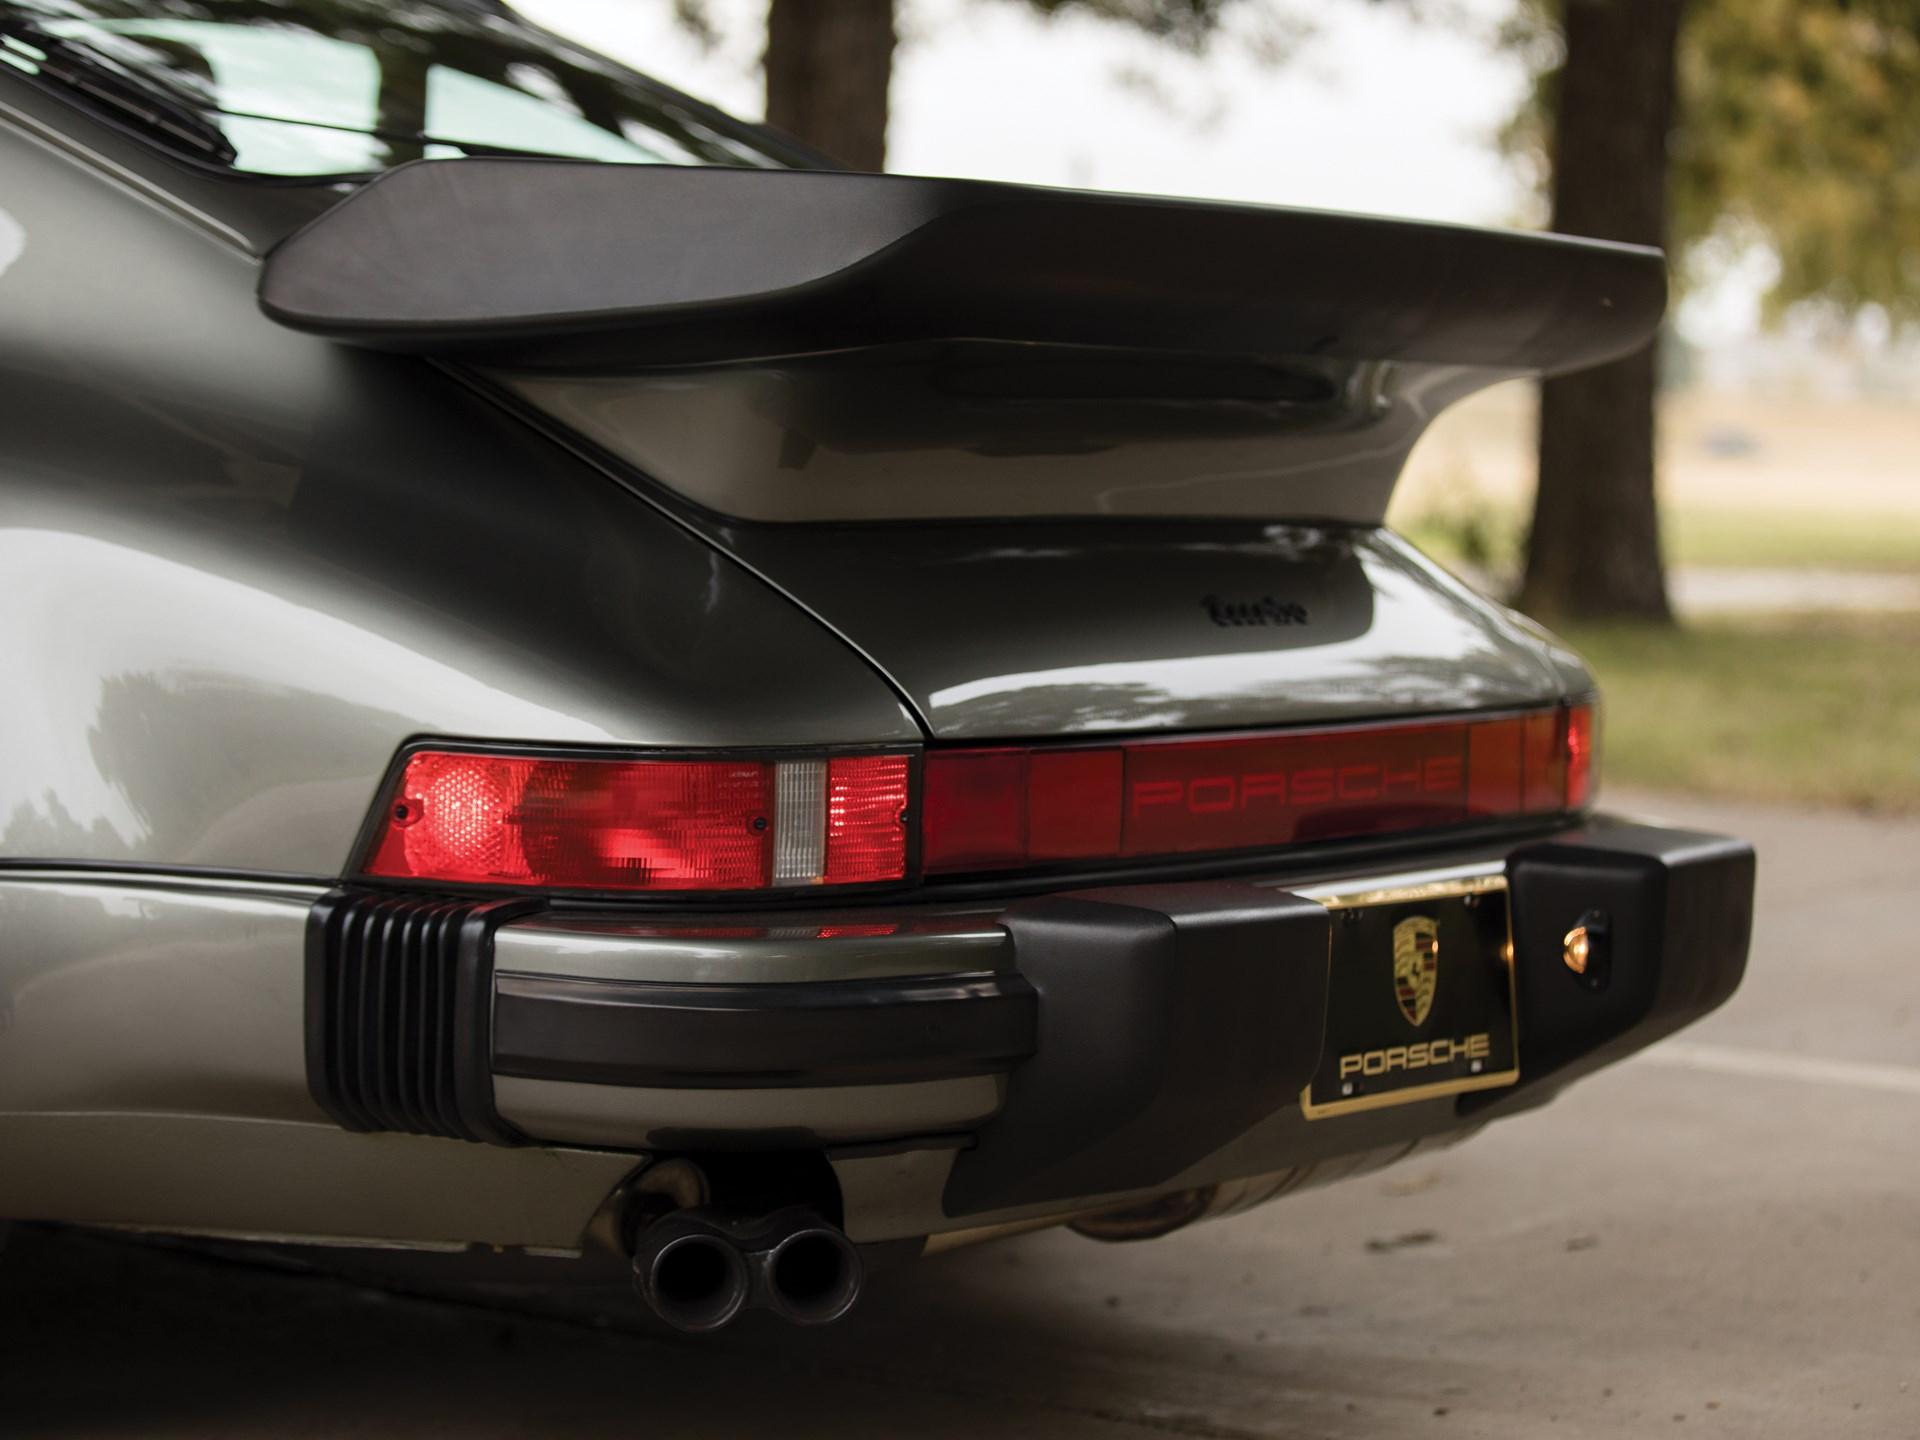 1988 Porsche 911 Turbo 'Flat Nose' Coupe